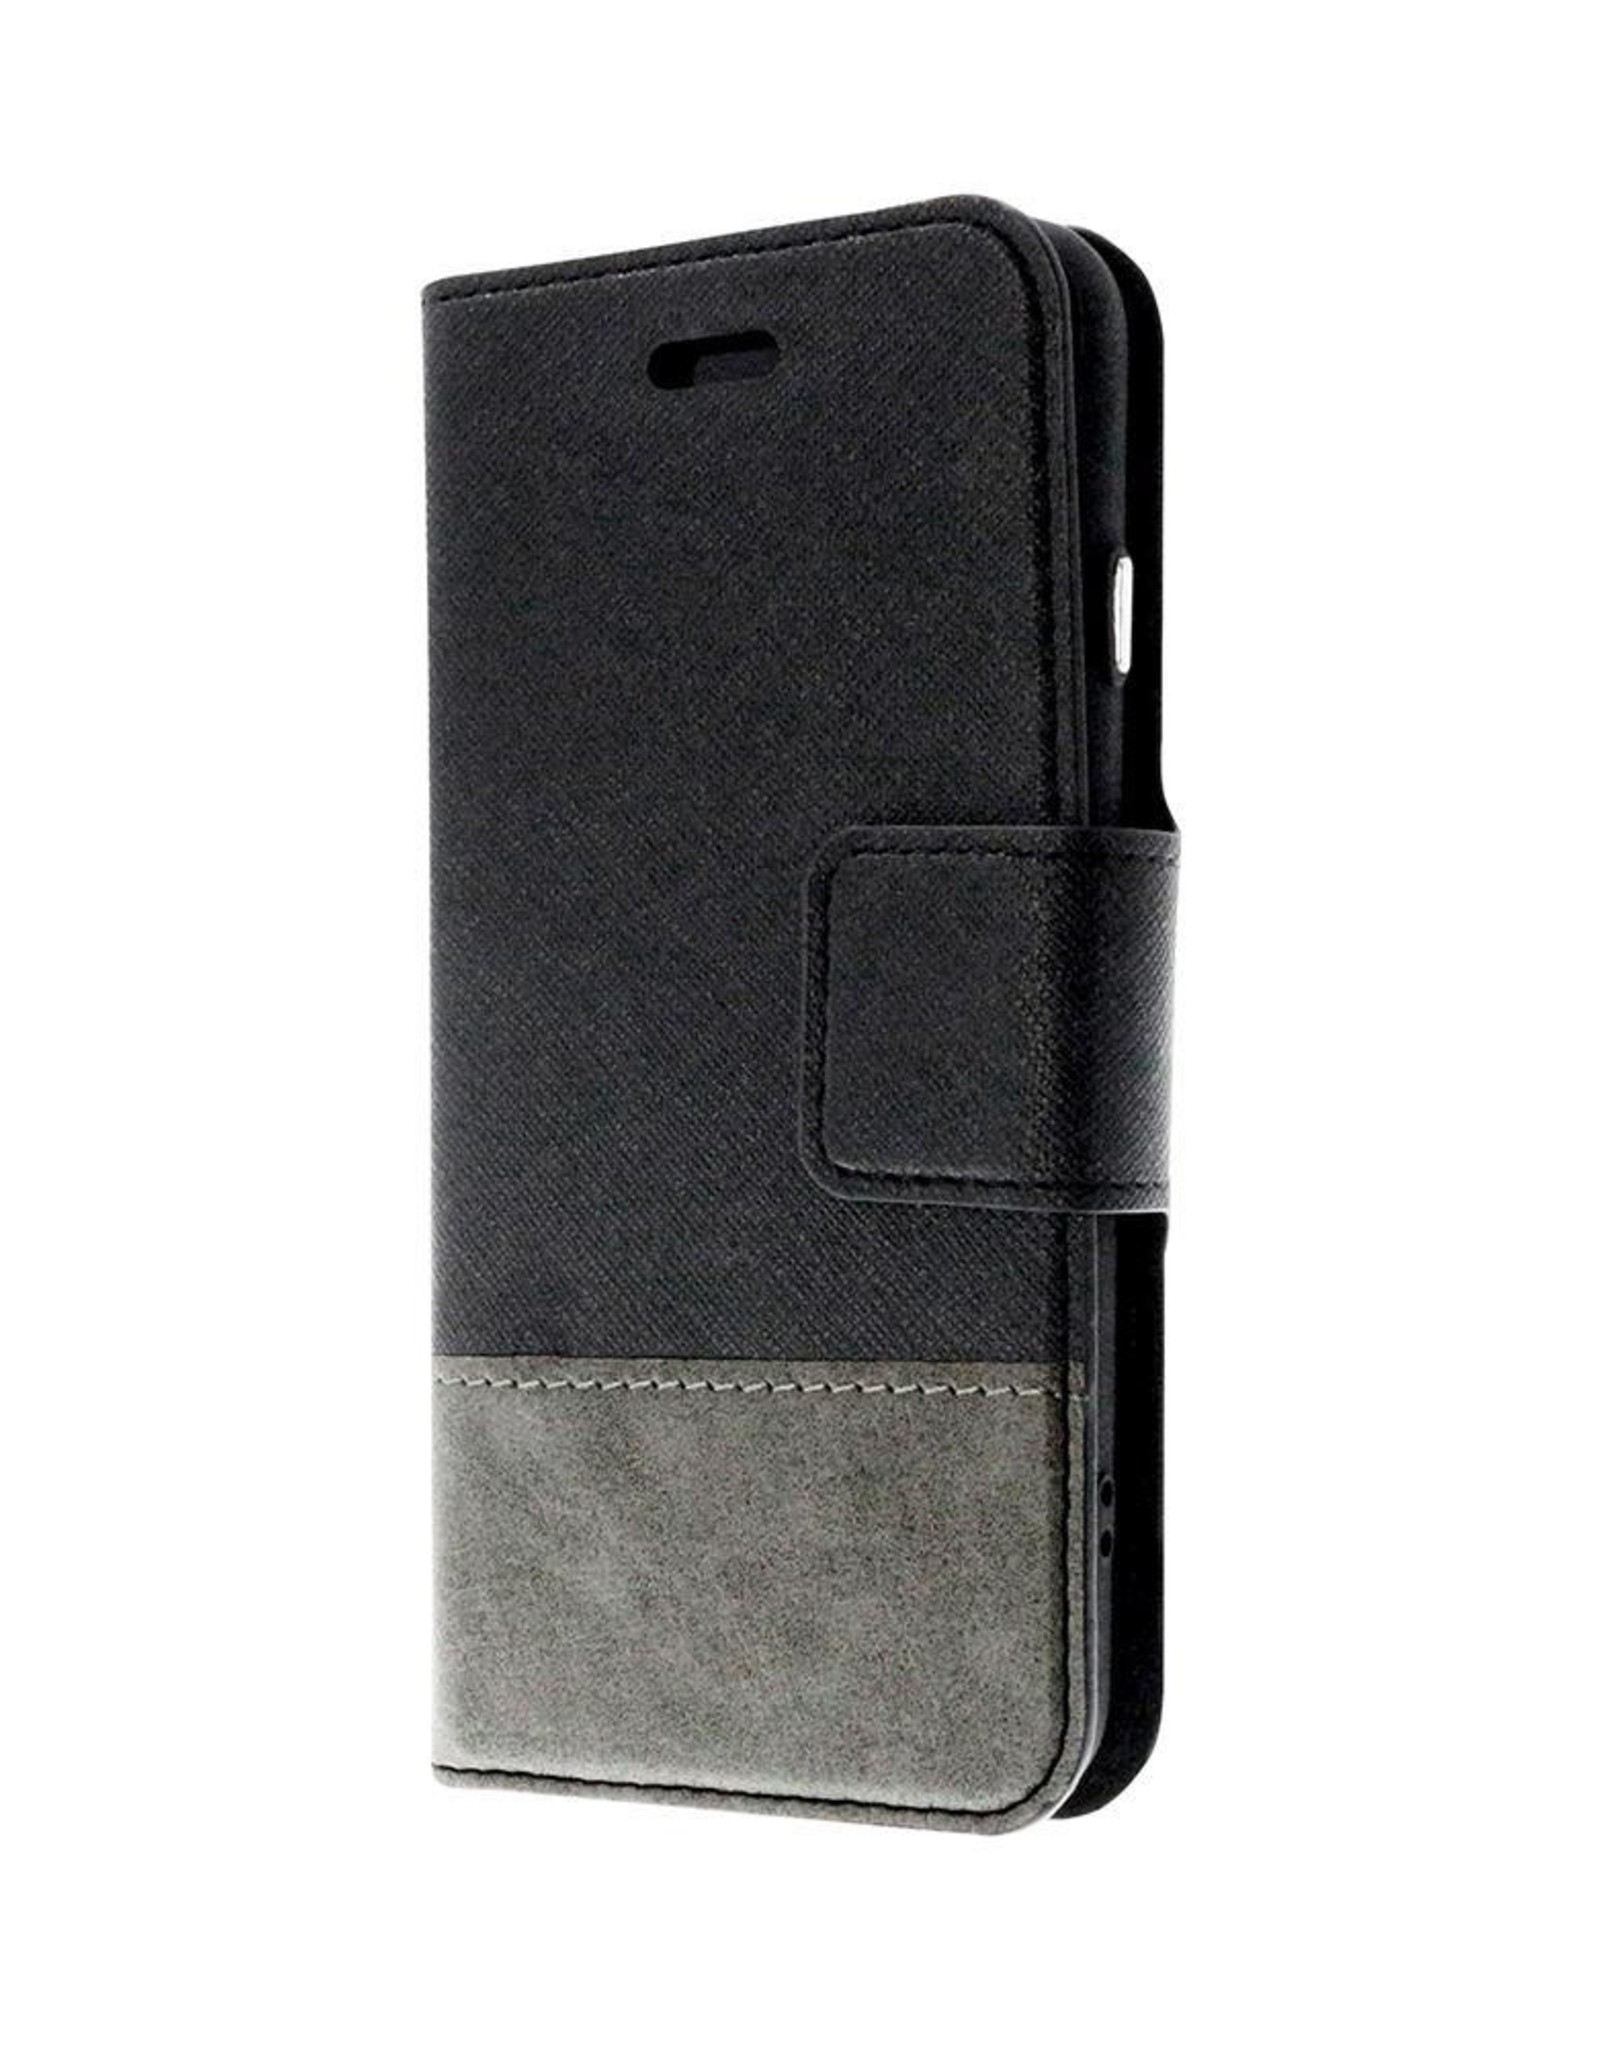 Caseco Caseco Broadway 2-in-1 RFID Shield Folio Case - iPhone XR Black C3461-01